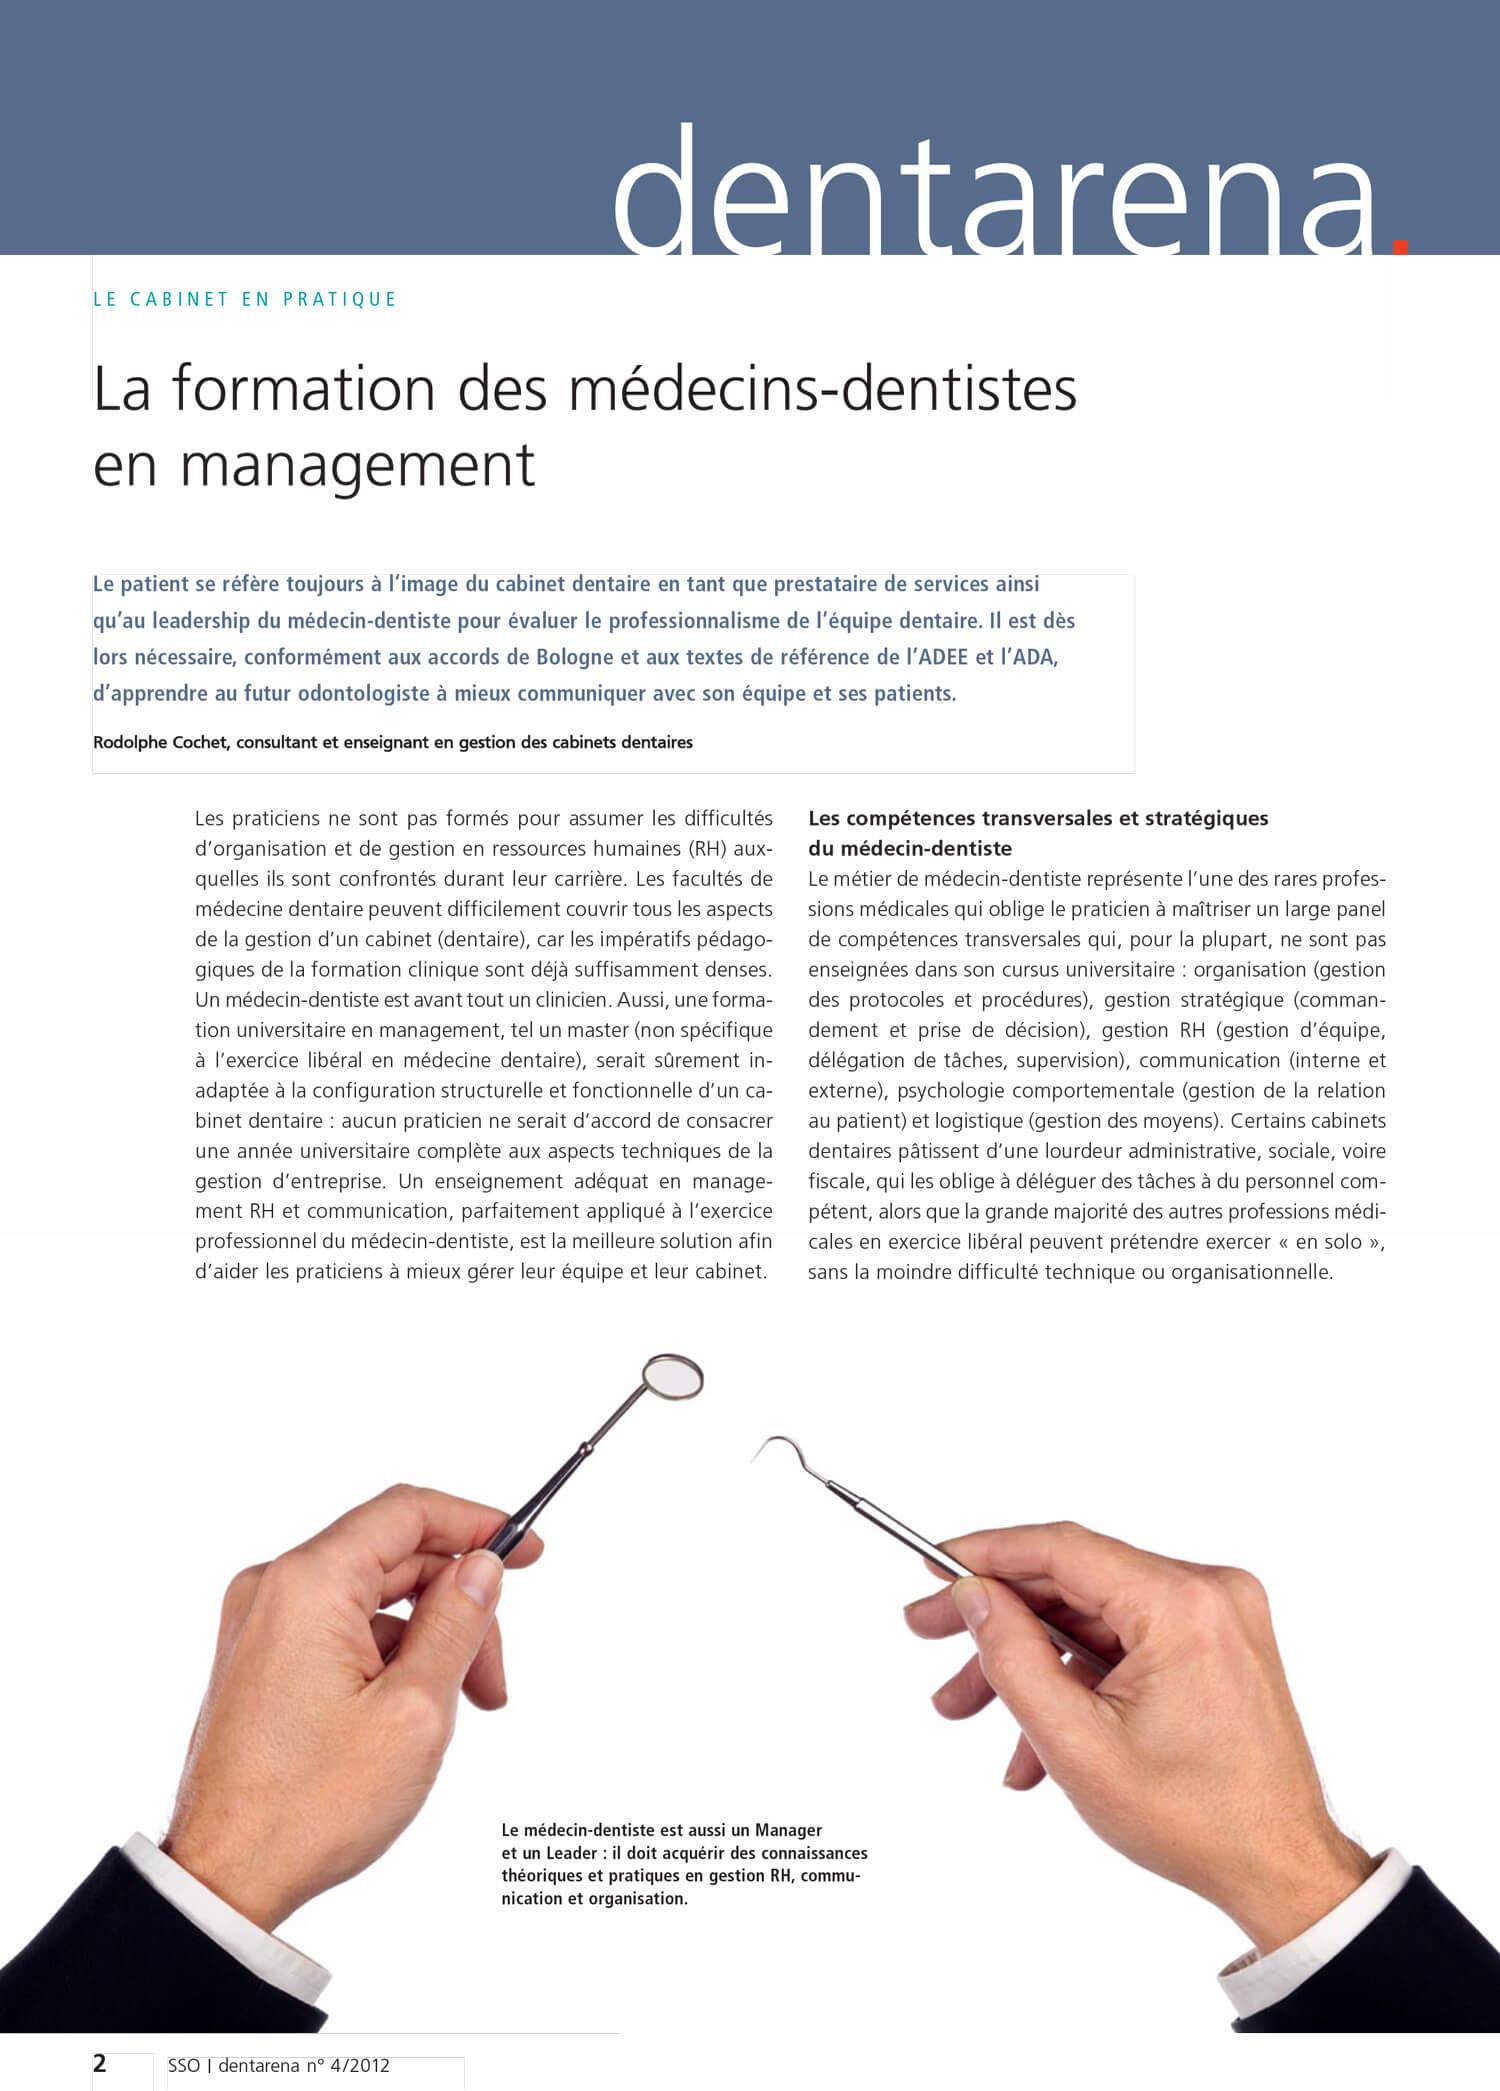 dentarena-revue-faculte-dentaire-suisse-formation-management-gestion-etudiant-rodolphe-cochet.jpg